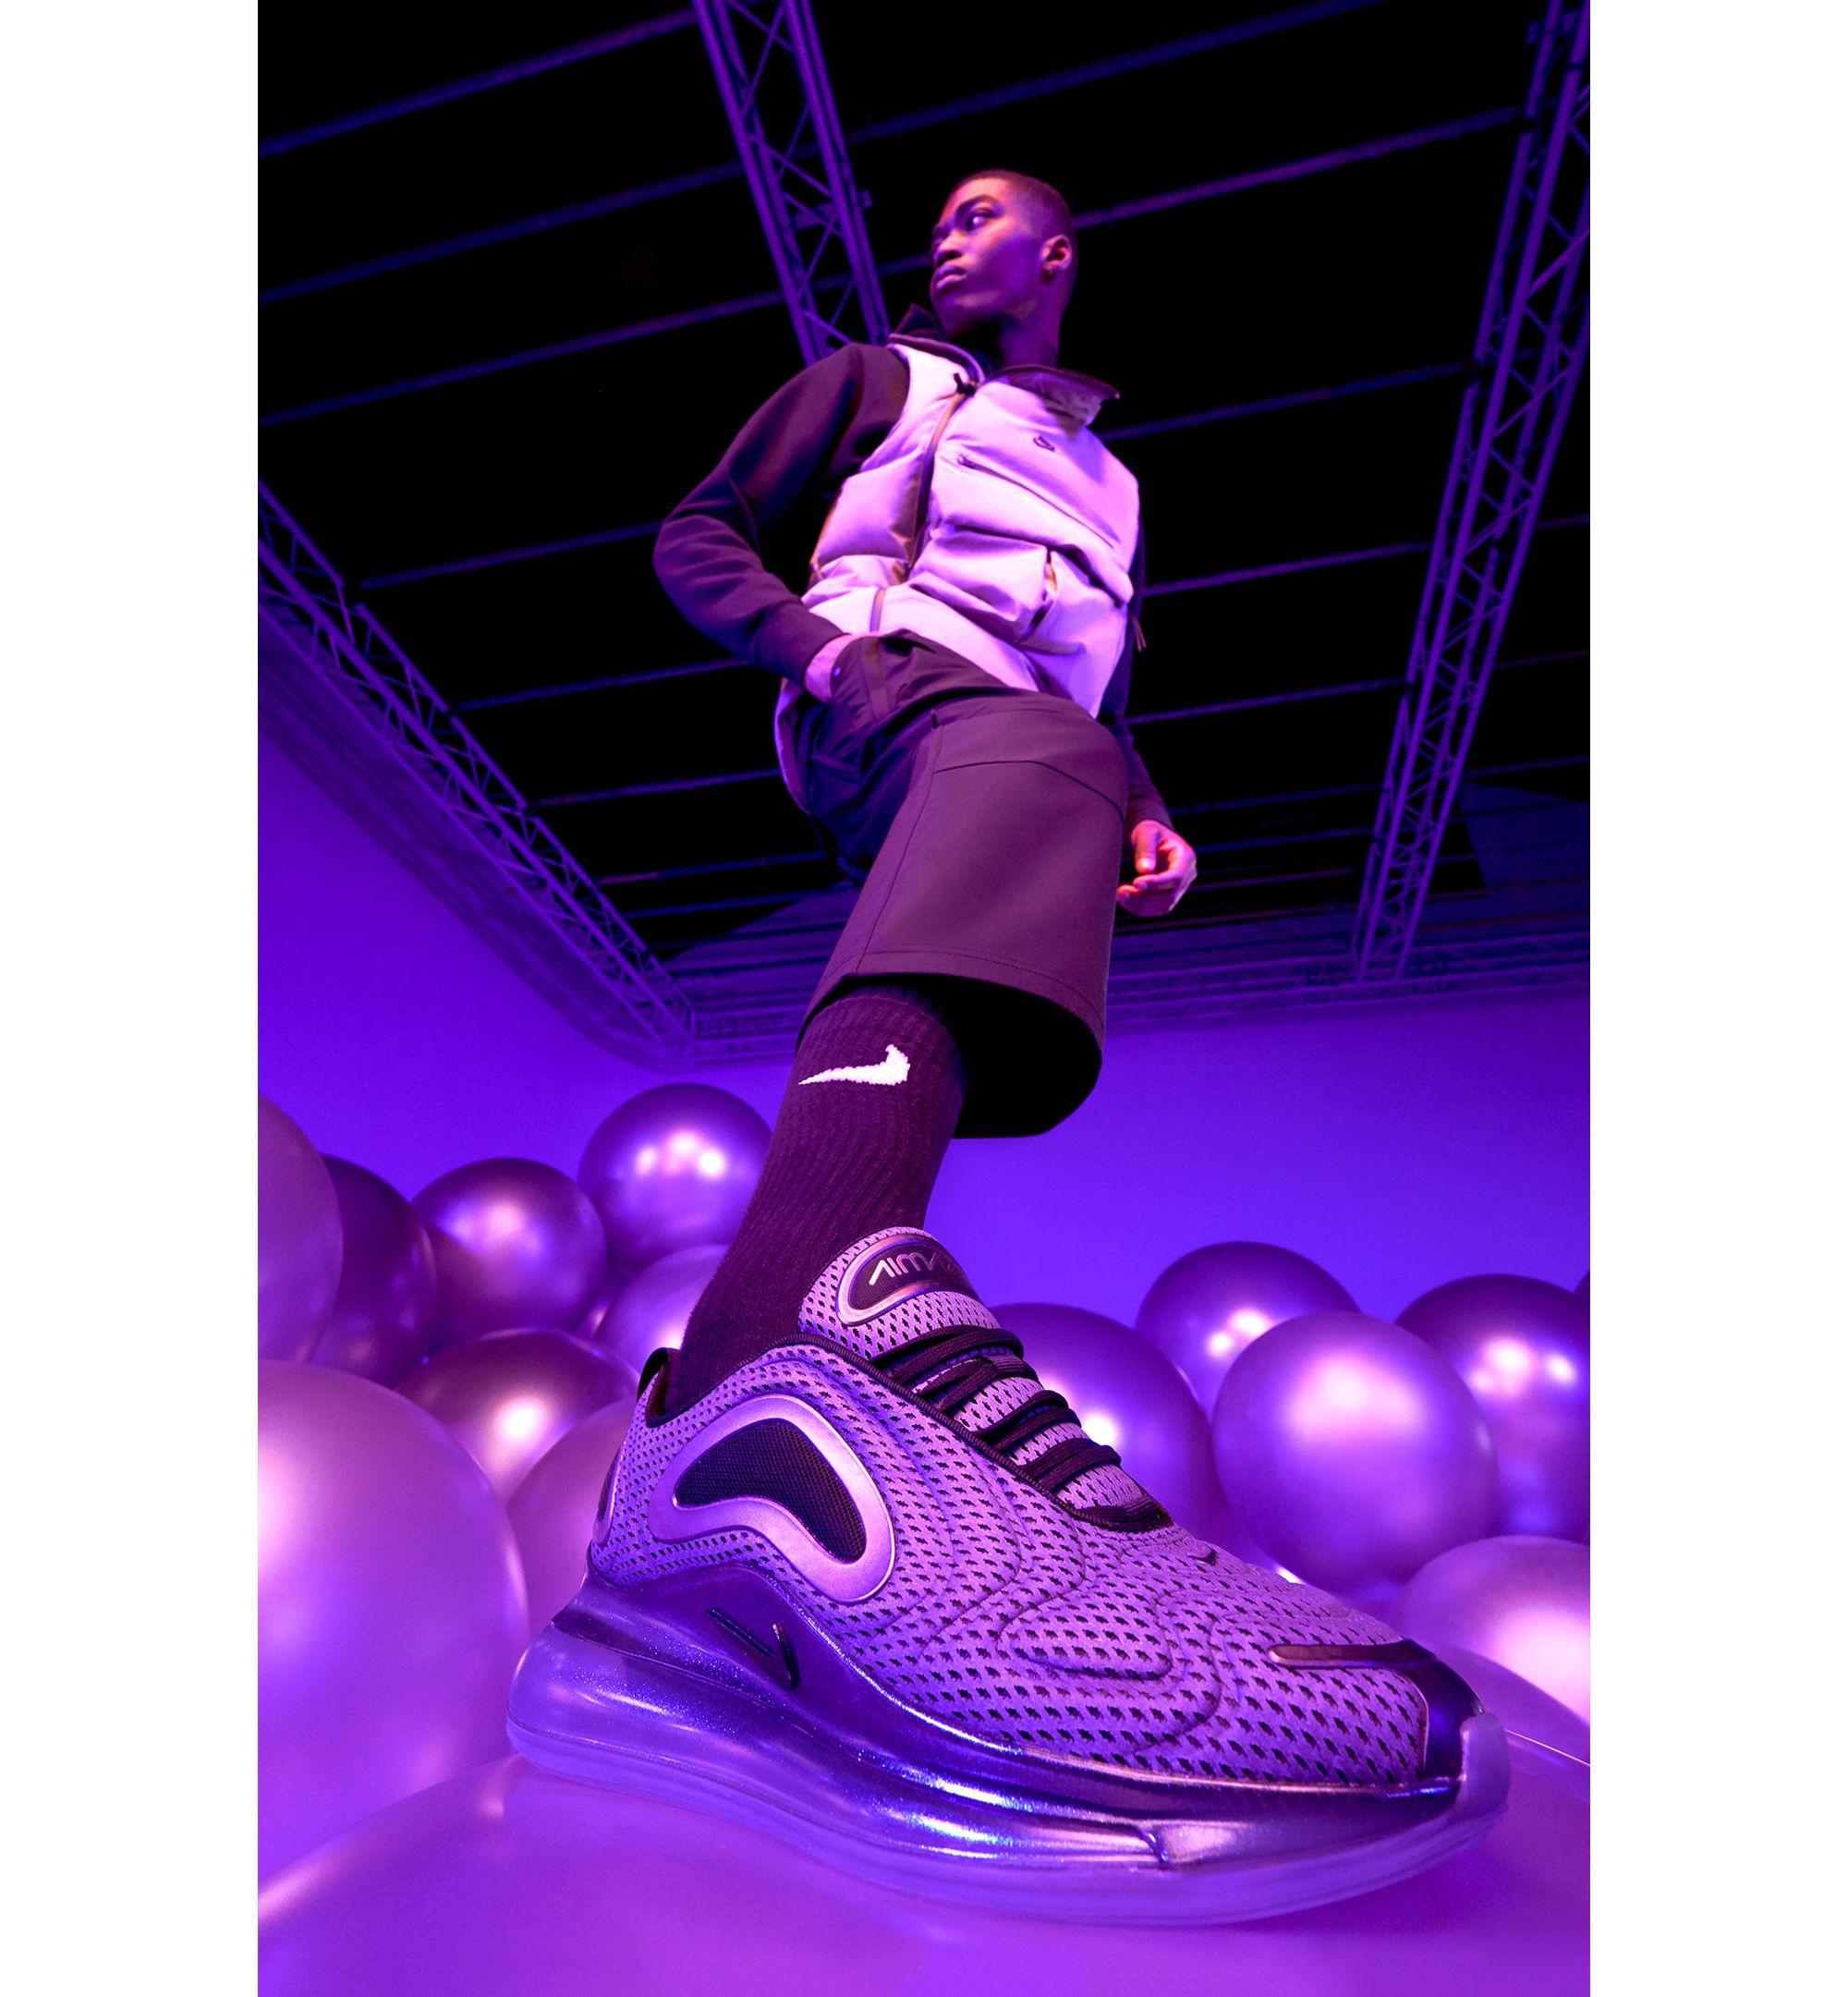 Nike Air Max 720 'Northern Lights Day